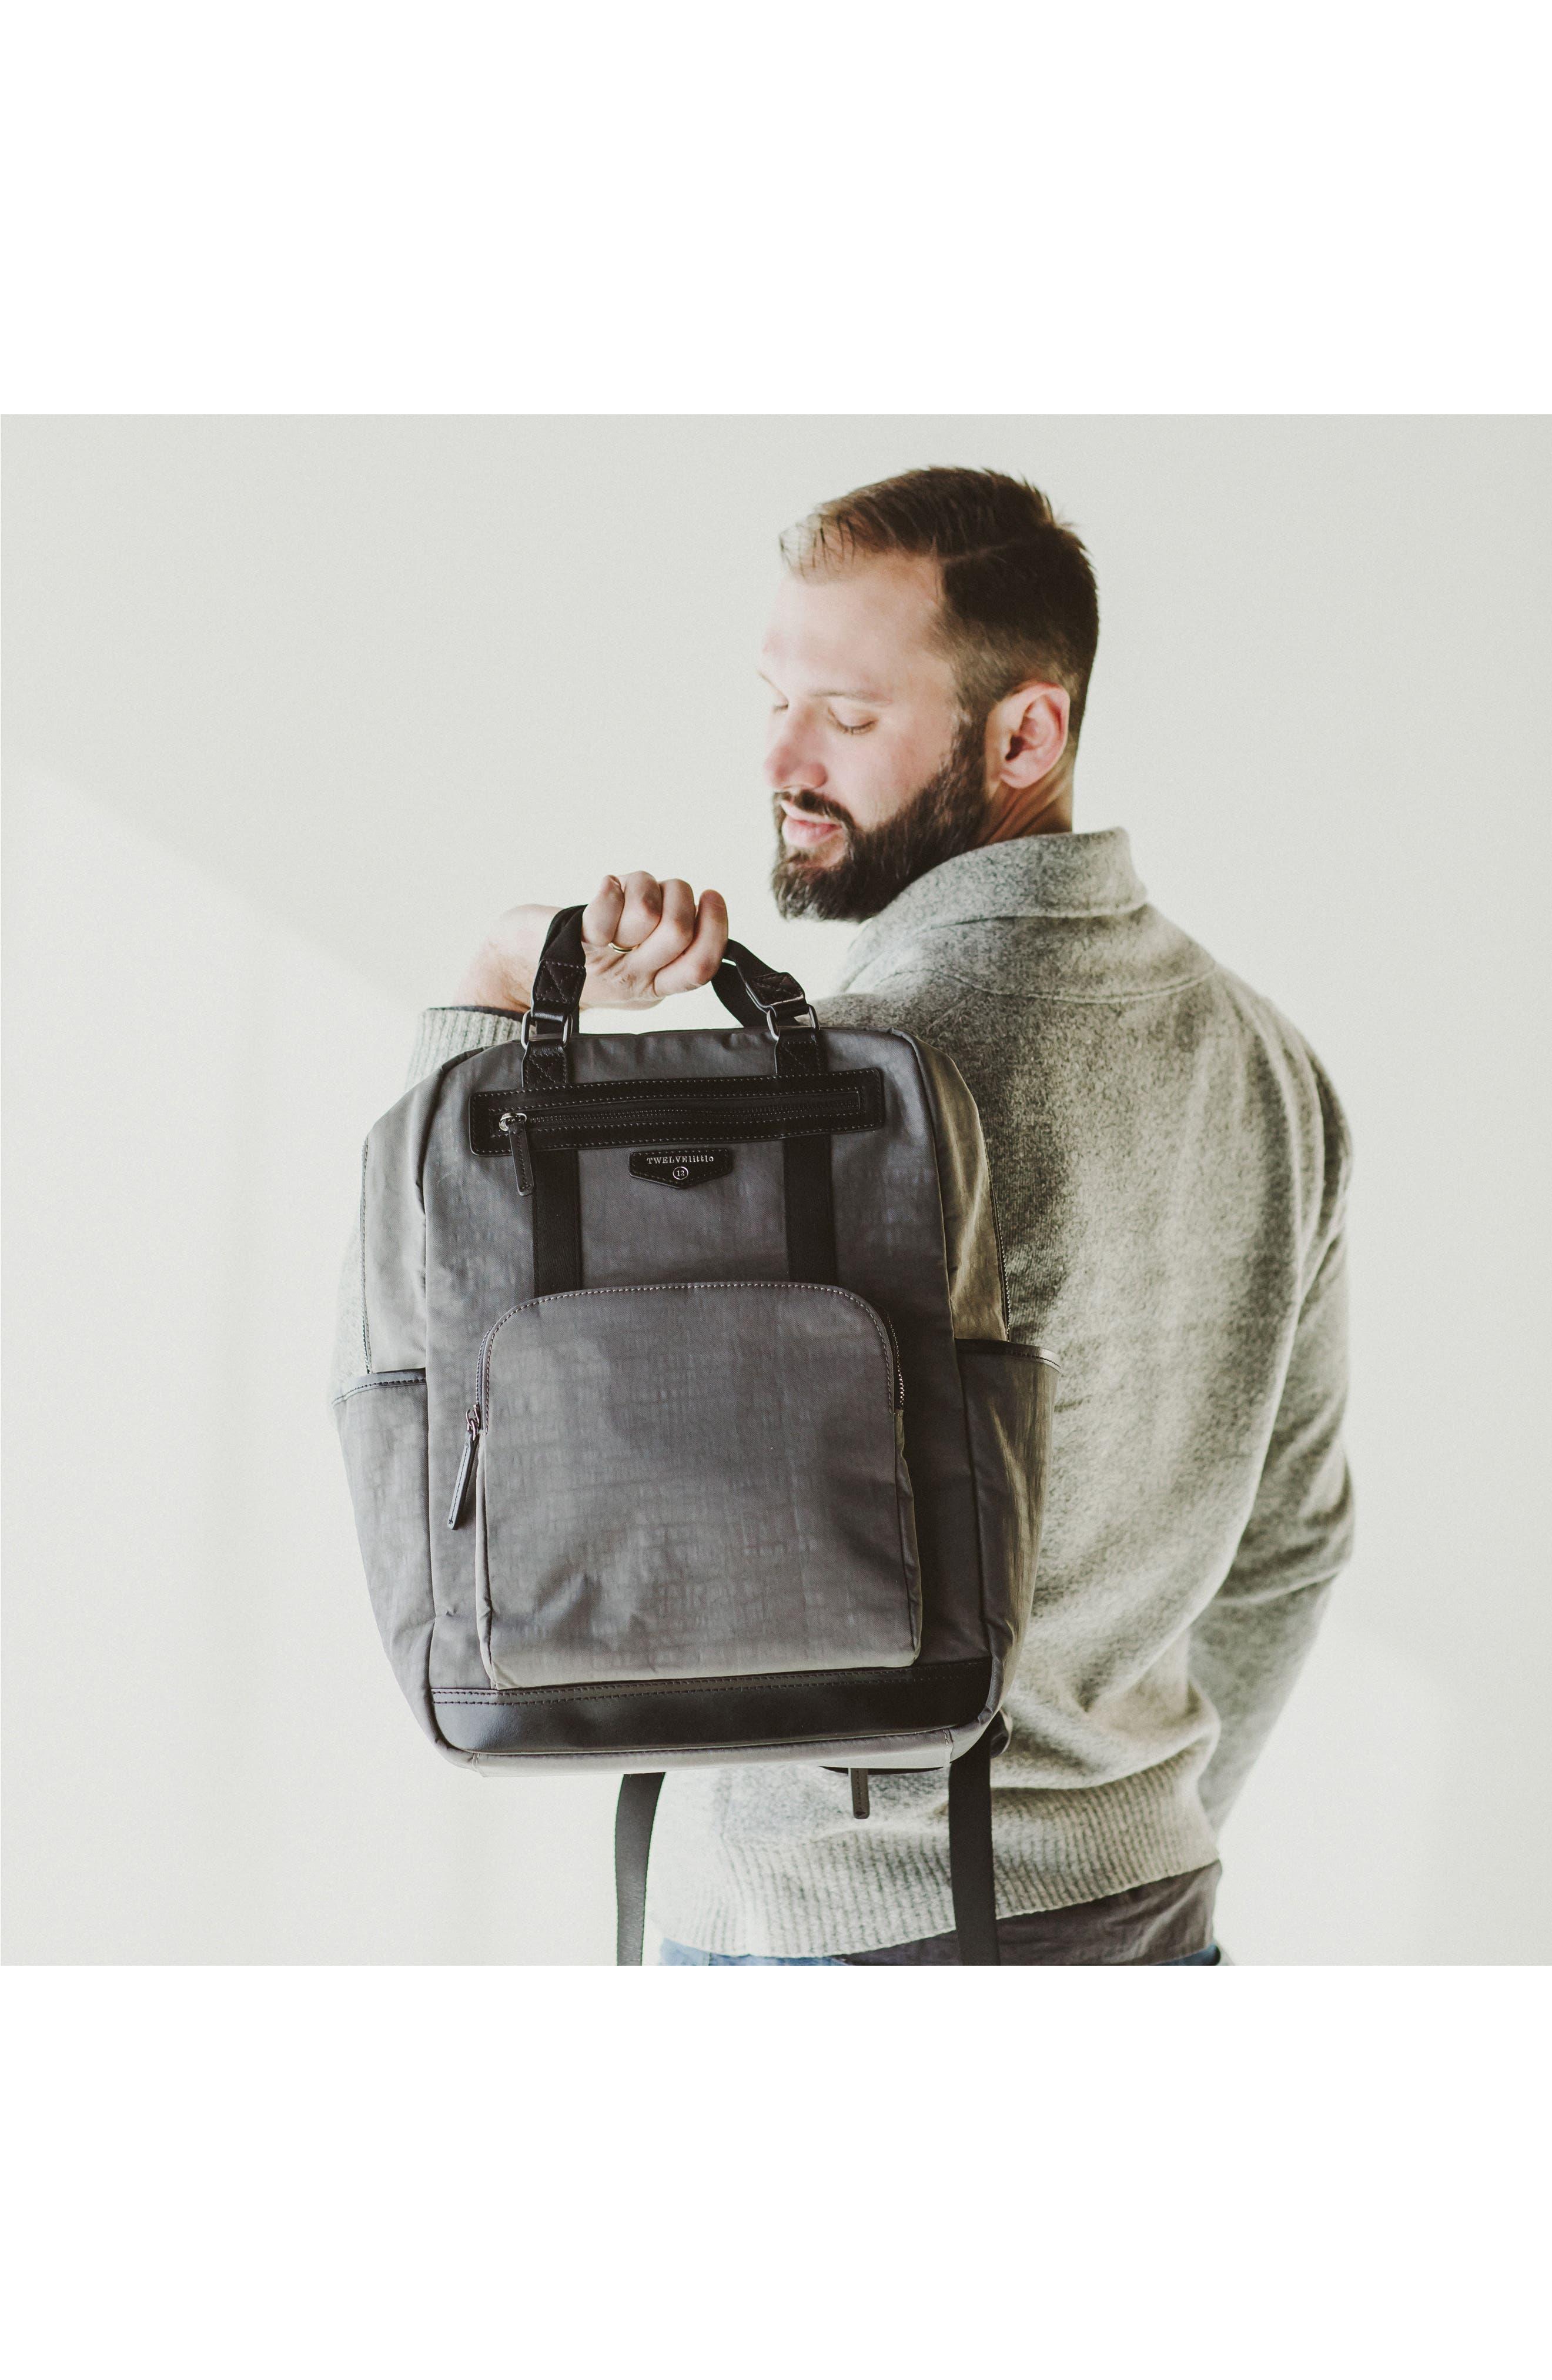 'Courage' Unisex Backpack Diaper Bag,                             Alternate thumbnail 10, color,                             DARK GREY